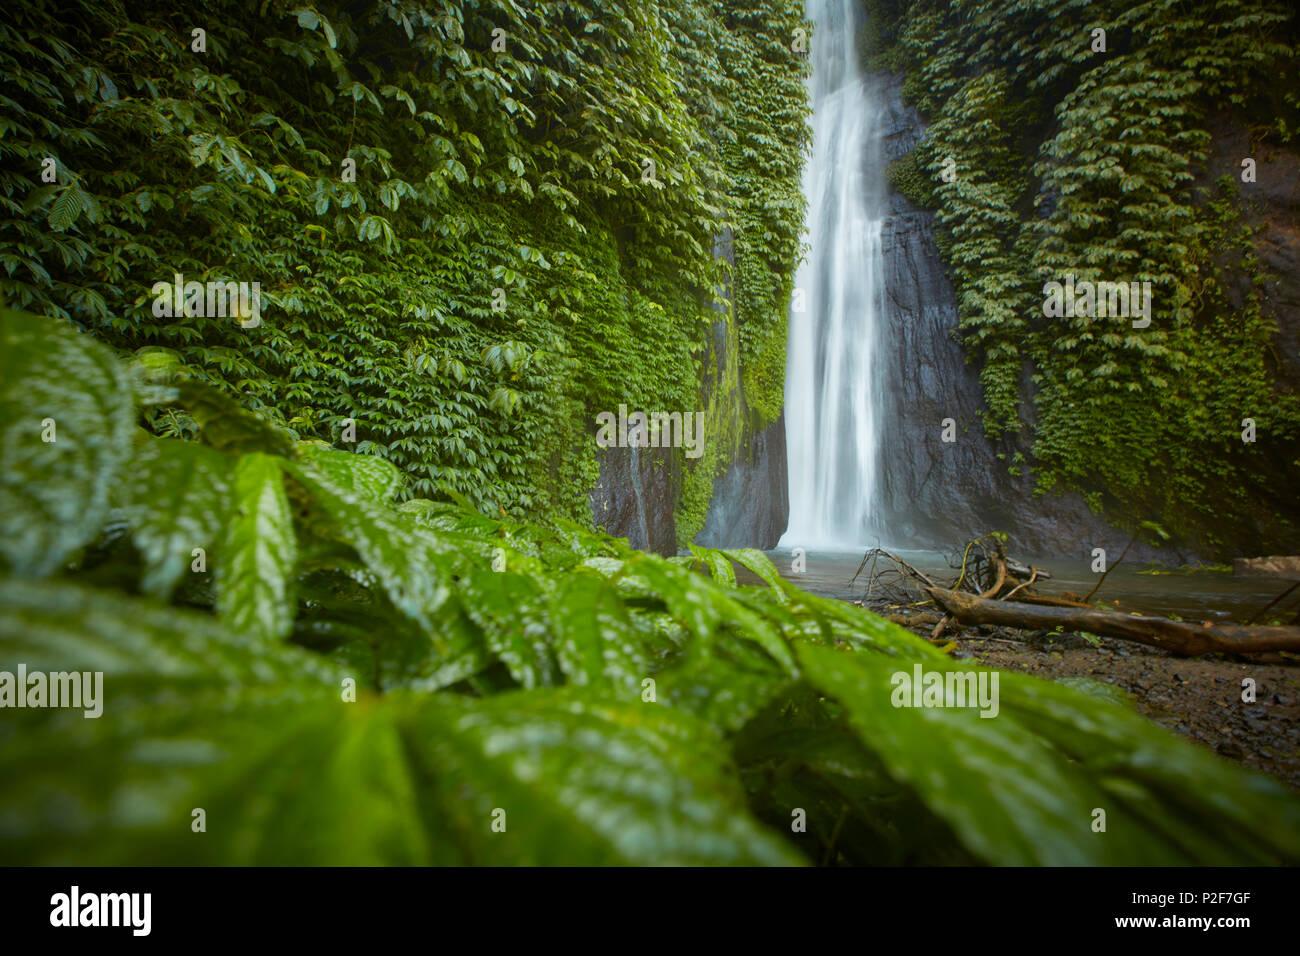 MUNUK Cascade, près de Gobleg, nord de Bali, Indonésie Photo Stock